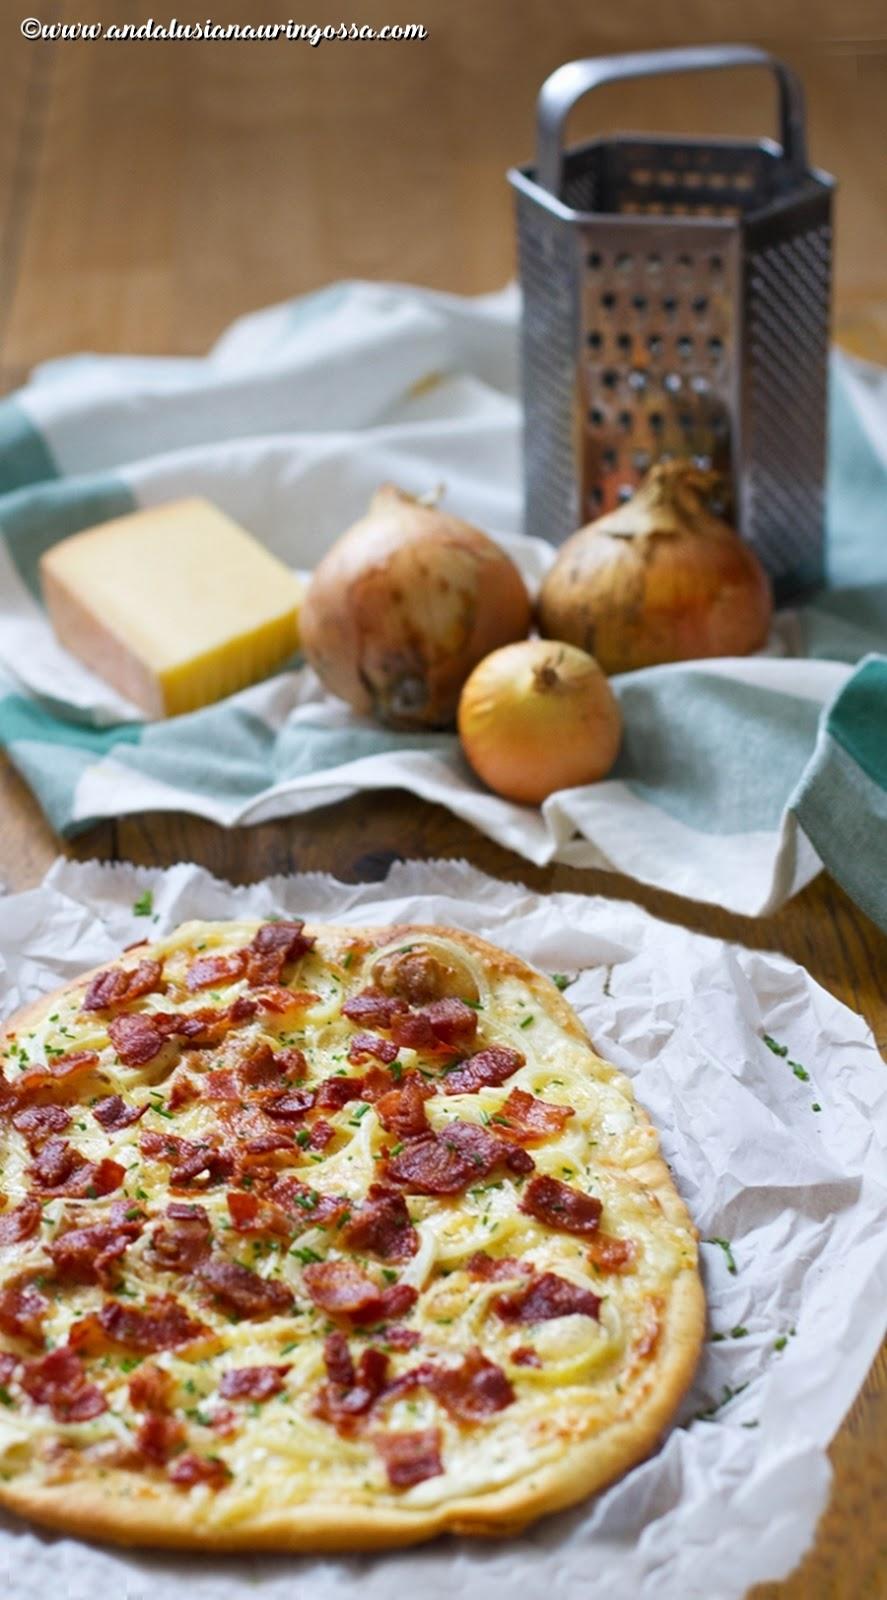 Tarte Flambee_Flammkuche_recipe_Alsace pizza_Andalusian auringossa_foodblog